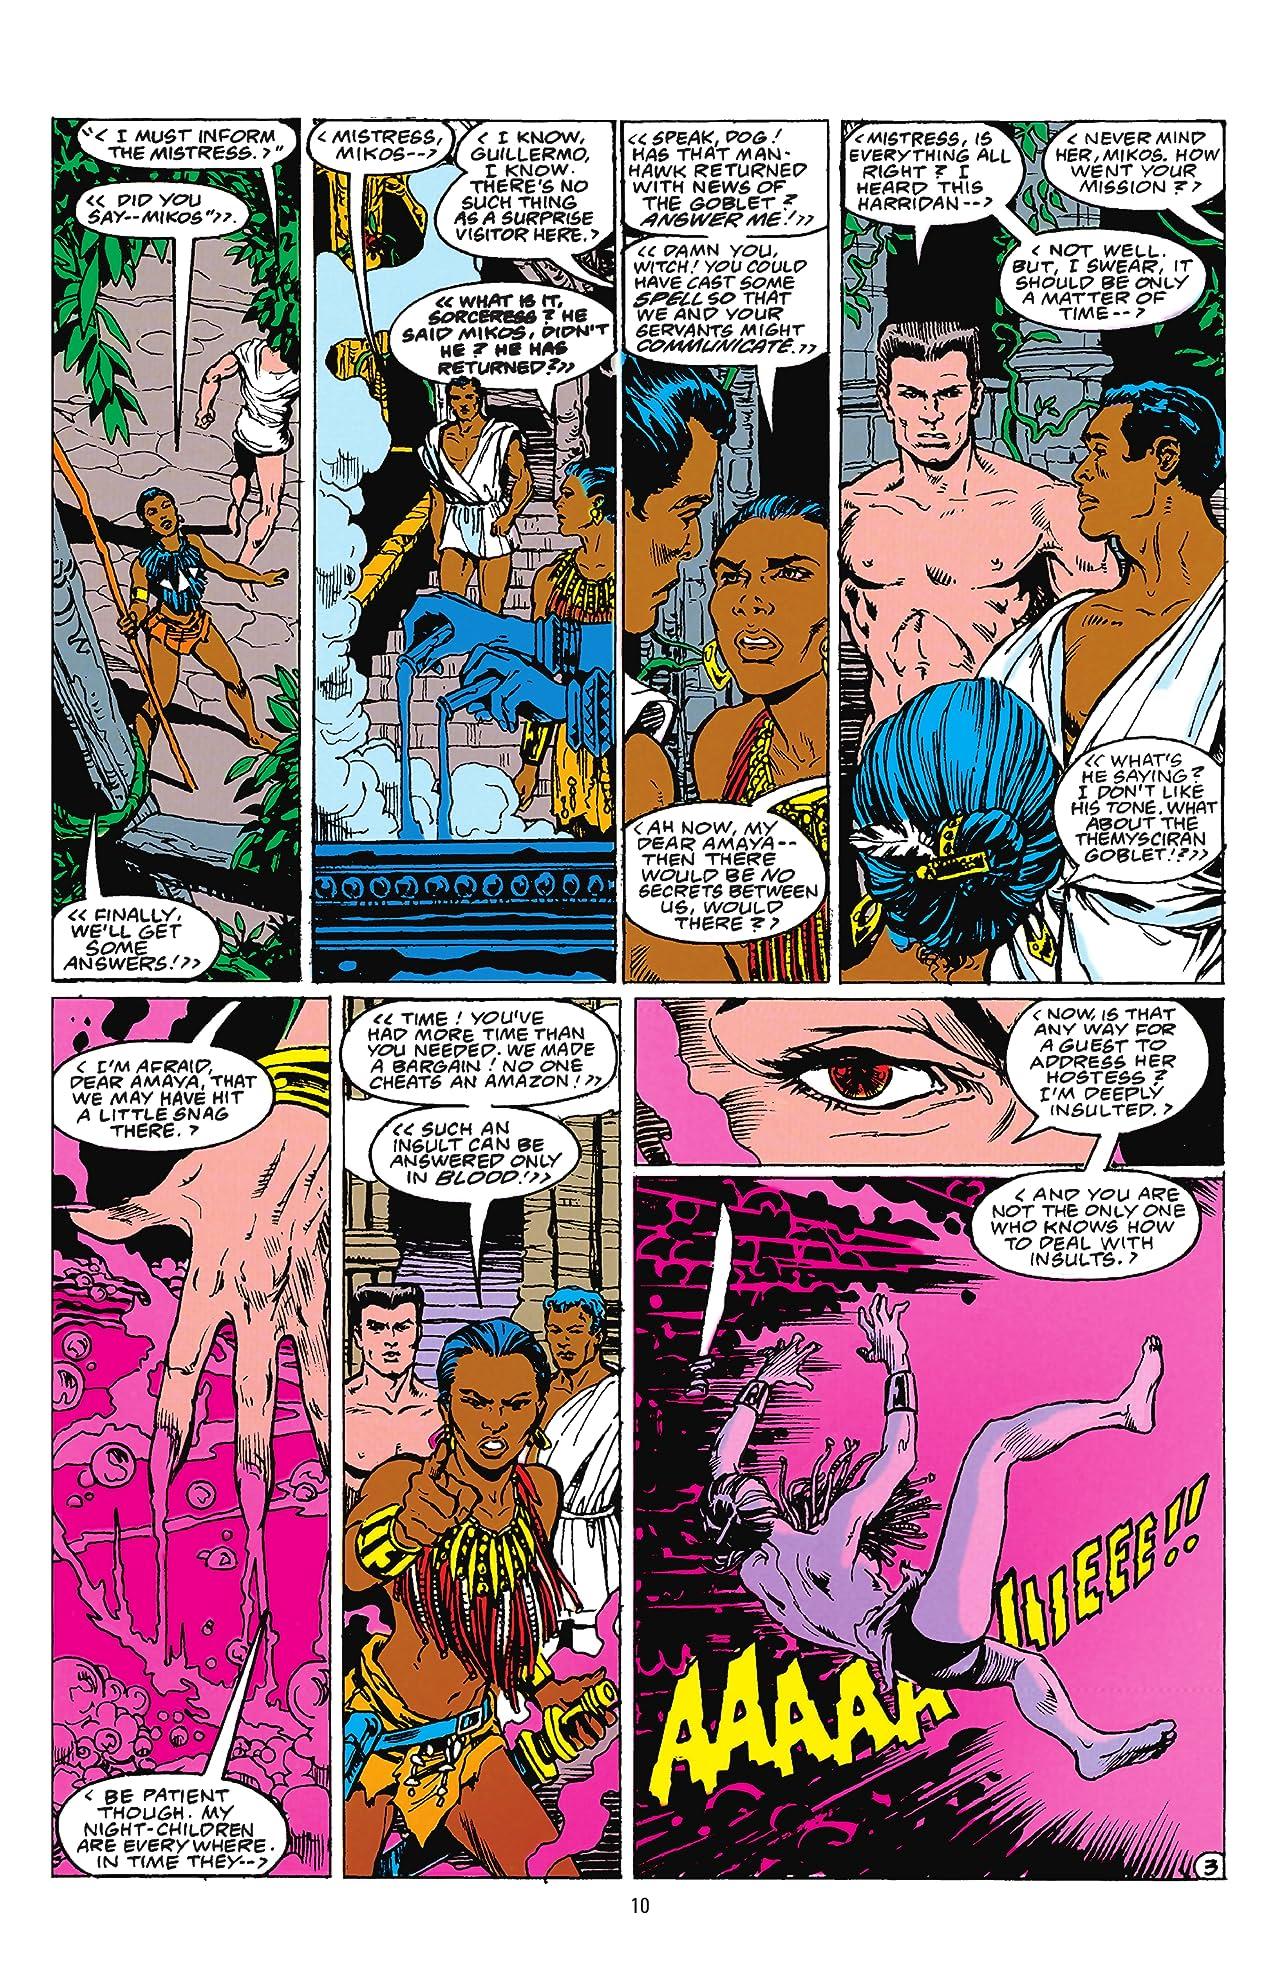 Wonder Woman by George Perez Vol. 6